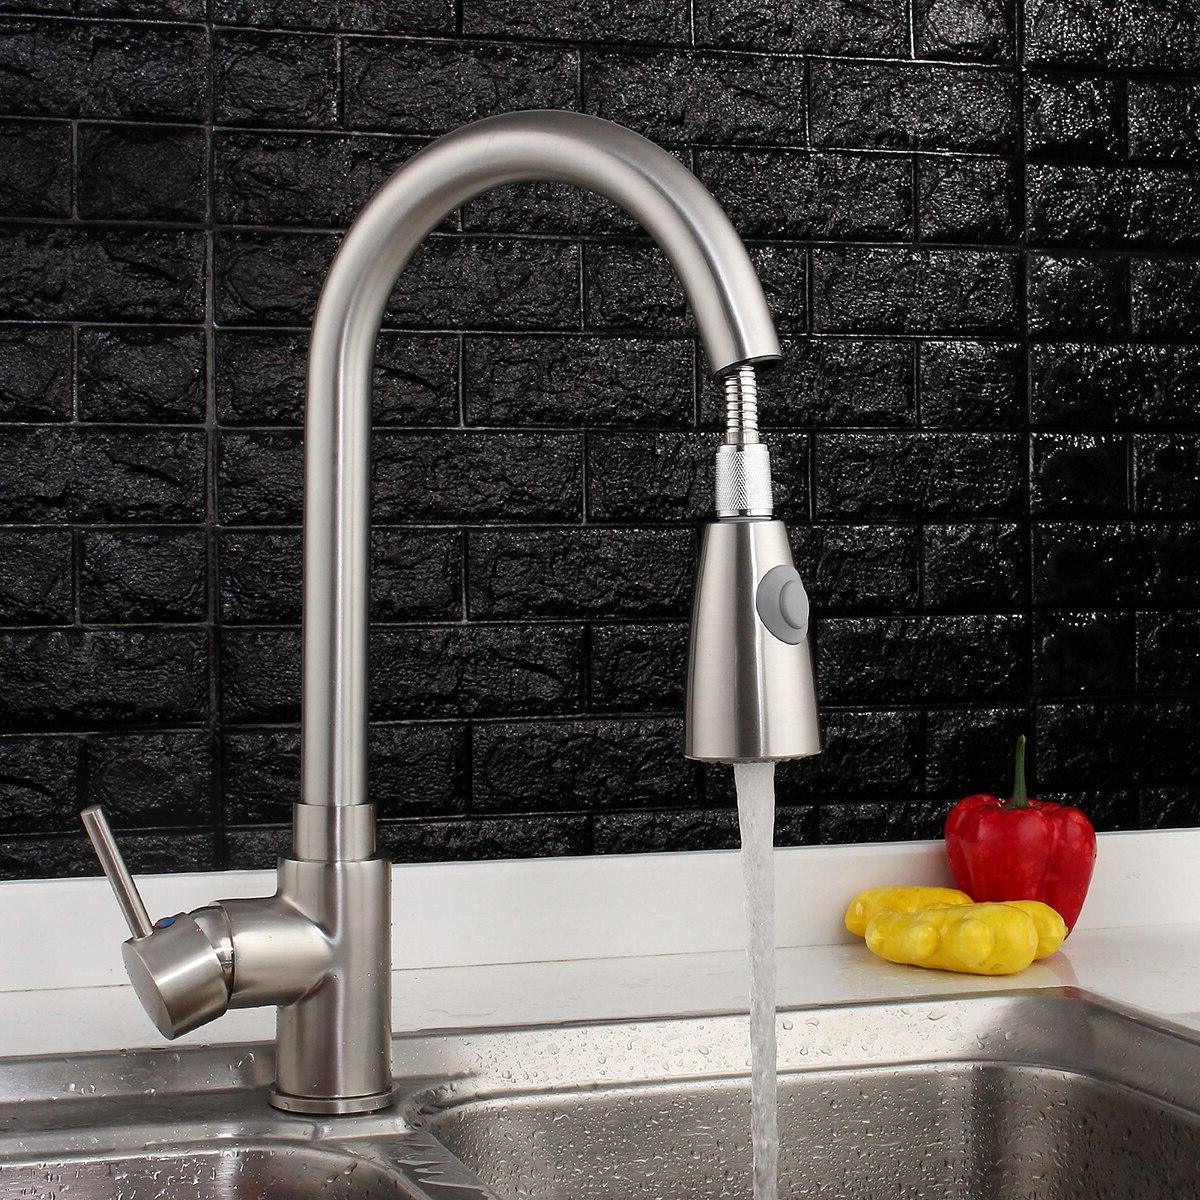 Nickel Brushed Degree Rotation Pull Basin Spray Swivel Single <font><b>Handle</b></font> Cold Mixer Tap